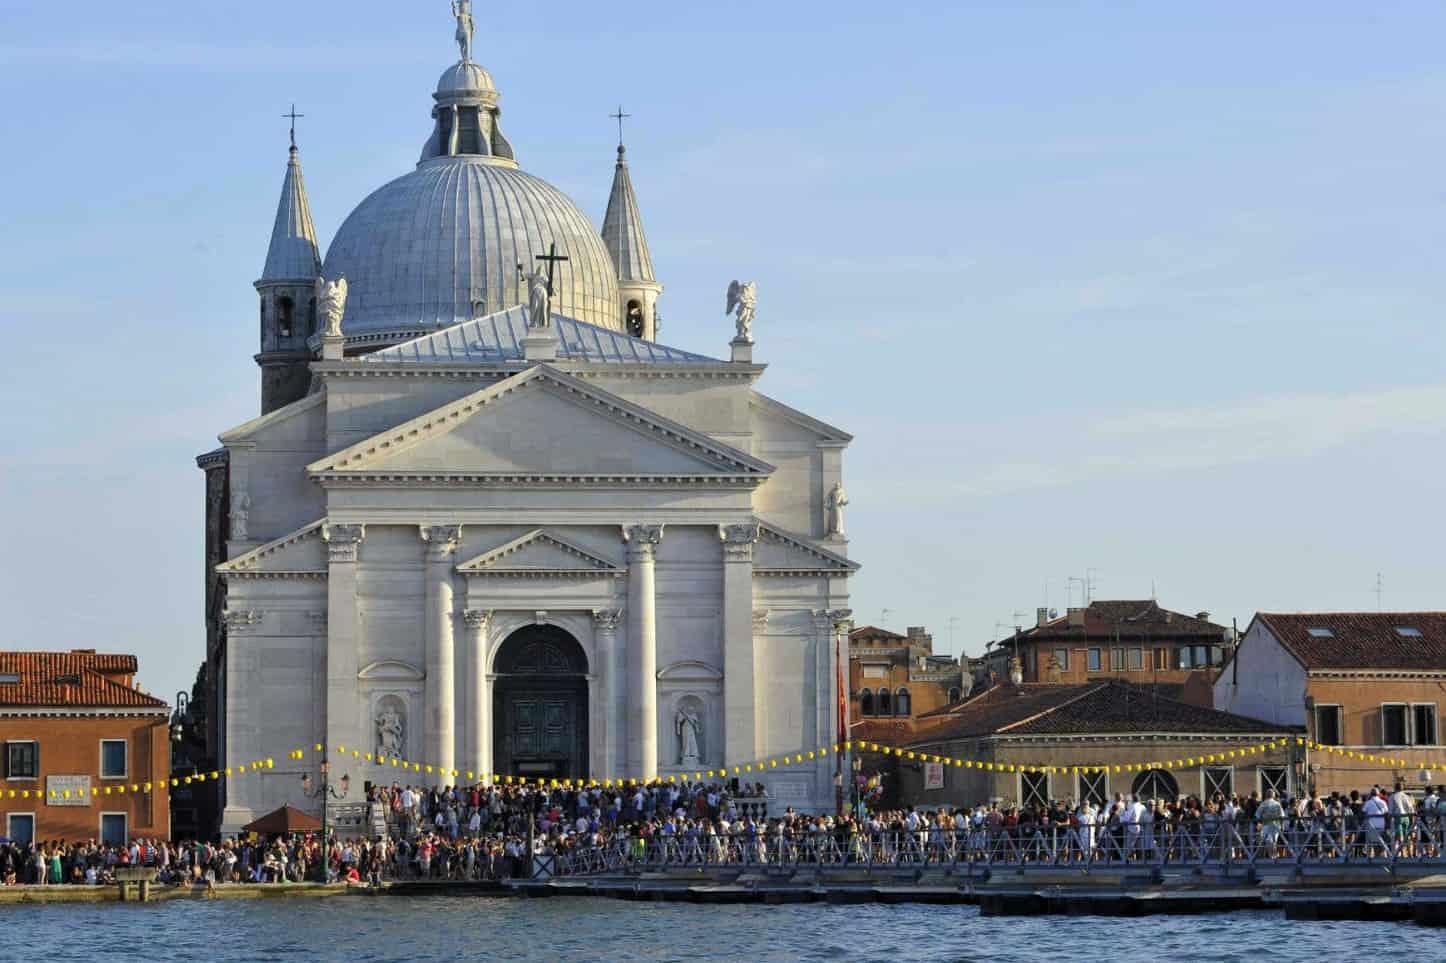 Venezia Festa del Redentore